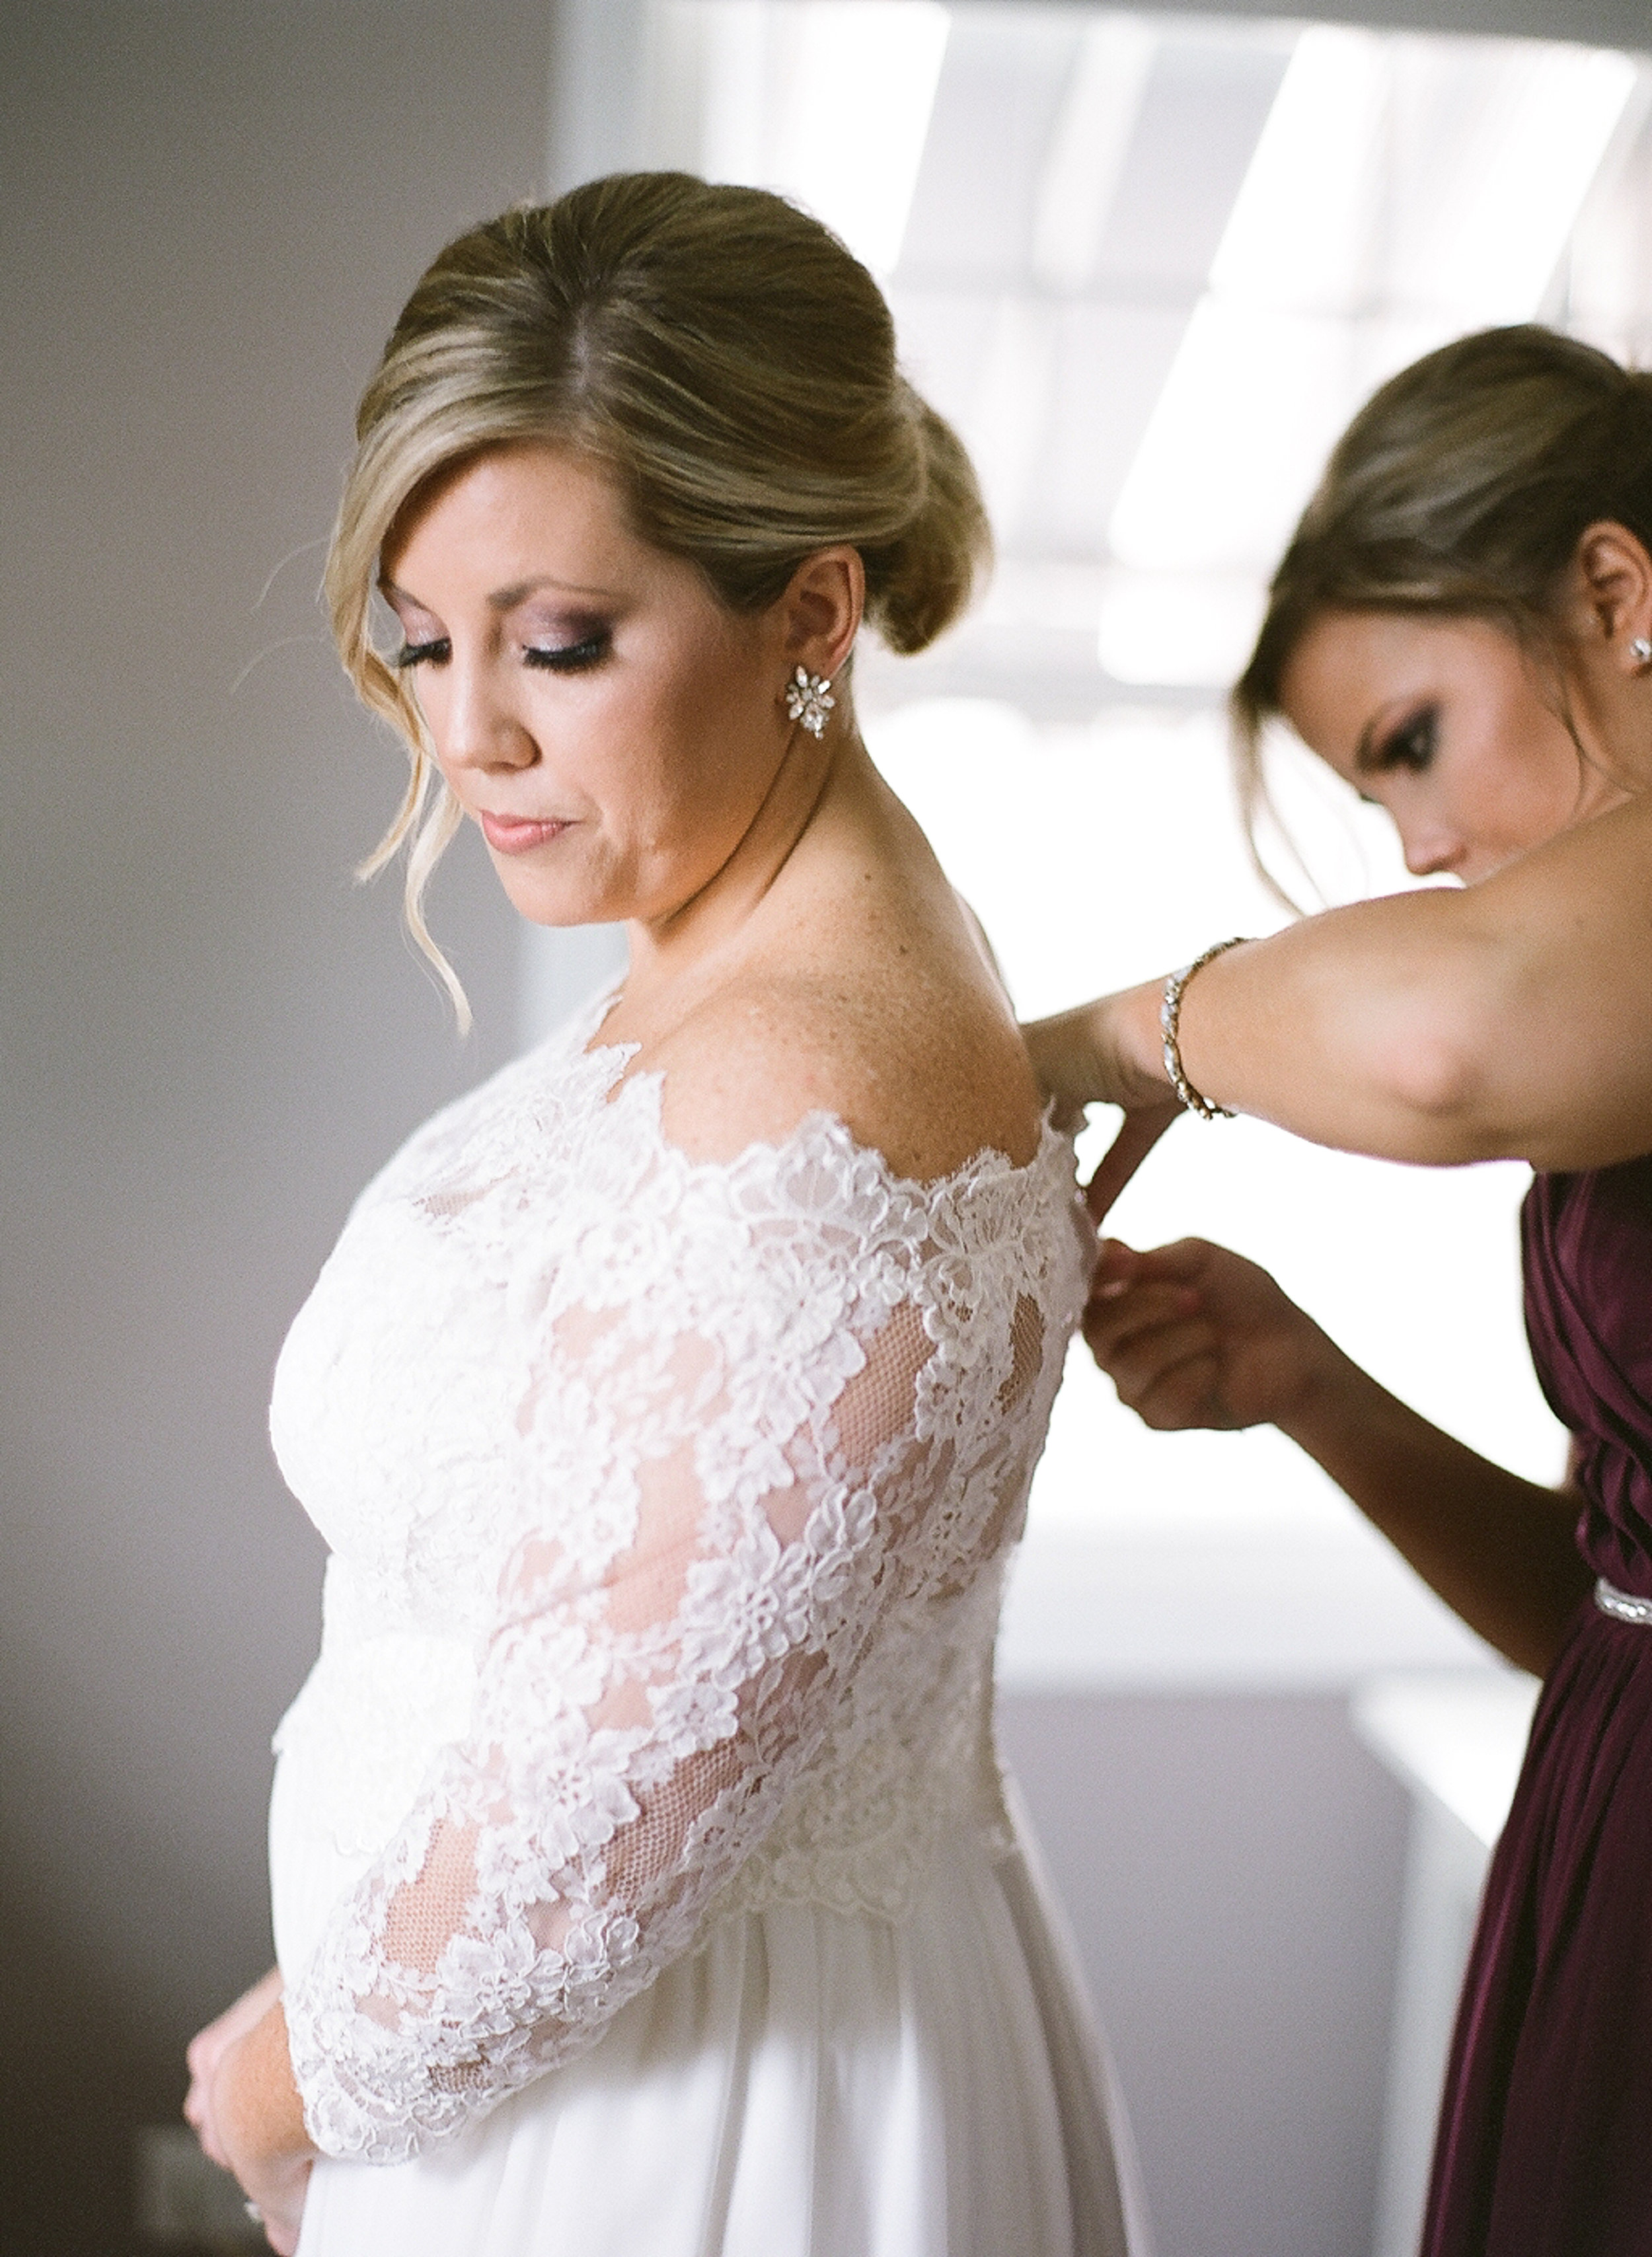 Bonphotage Chicago Fine Art Wedding Photography - Bridgeport Art Center